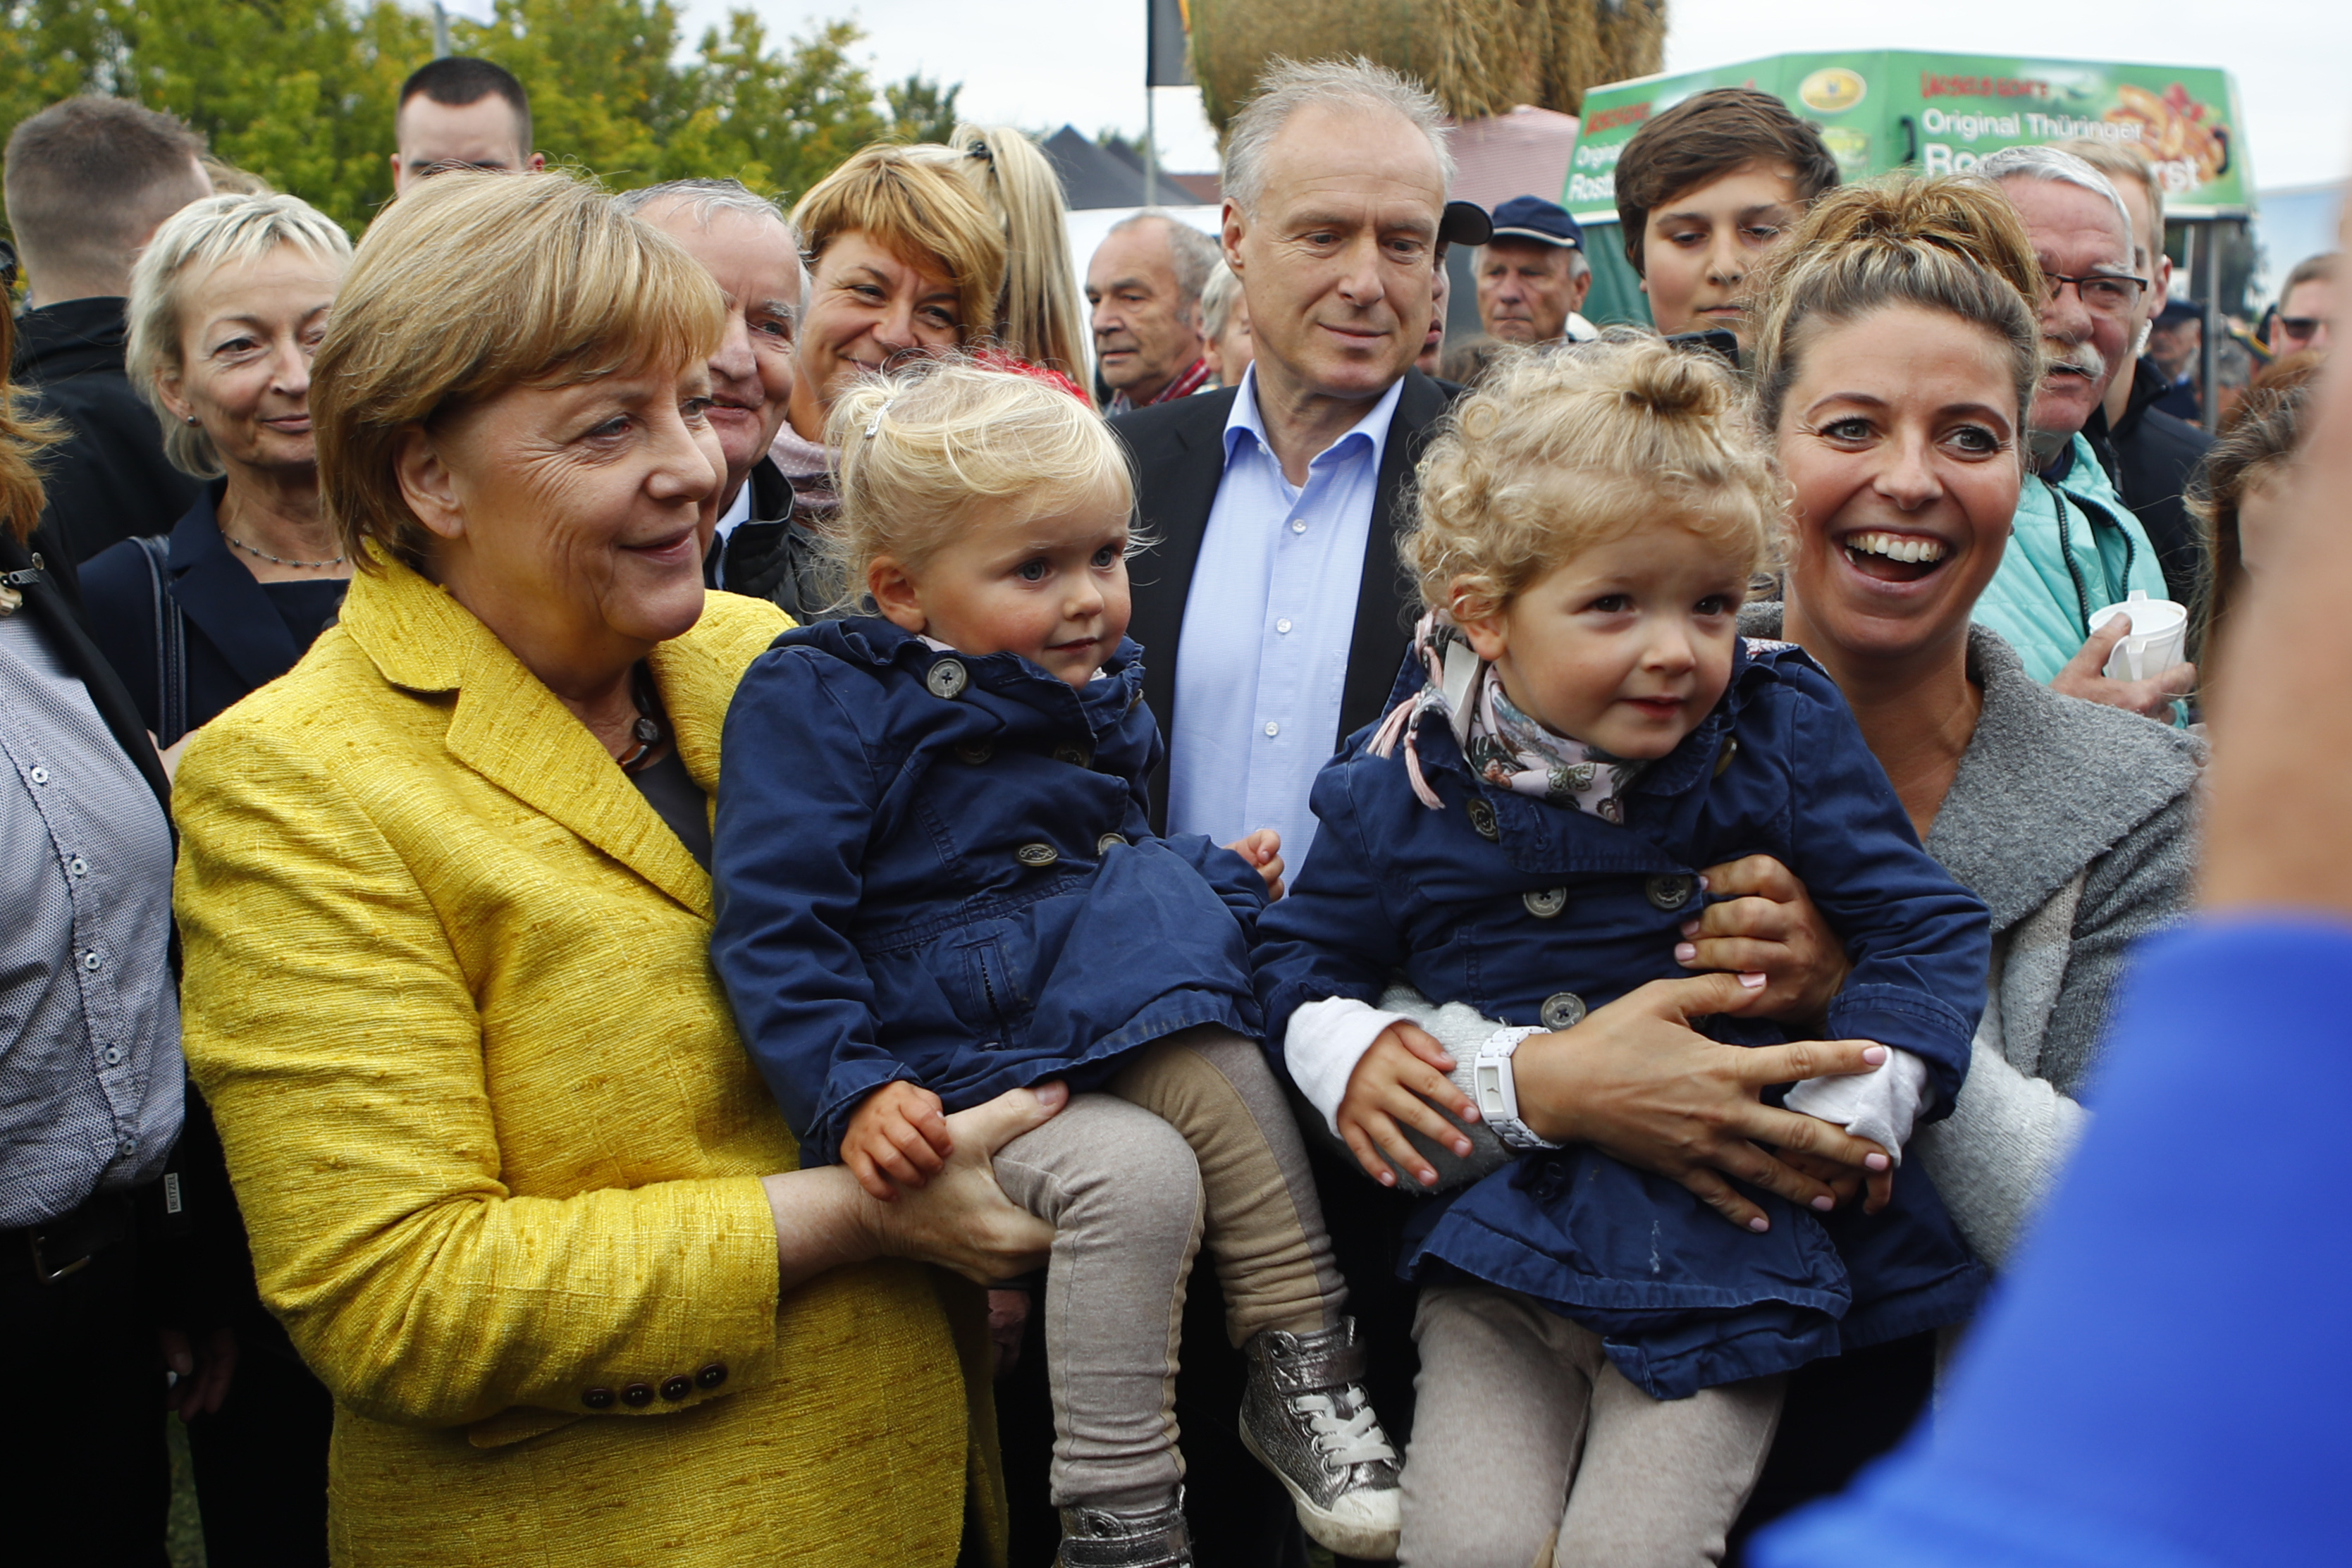 German Chancellor Merkel visits harvest festival in Lauterbach